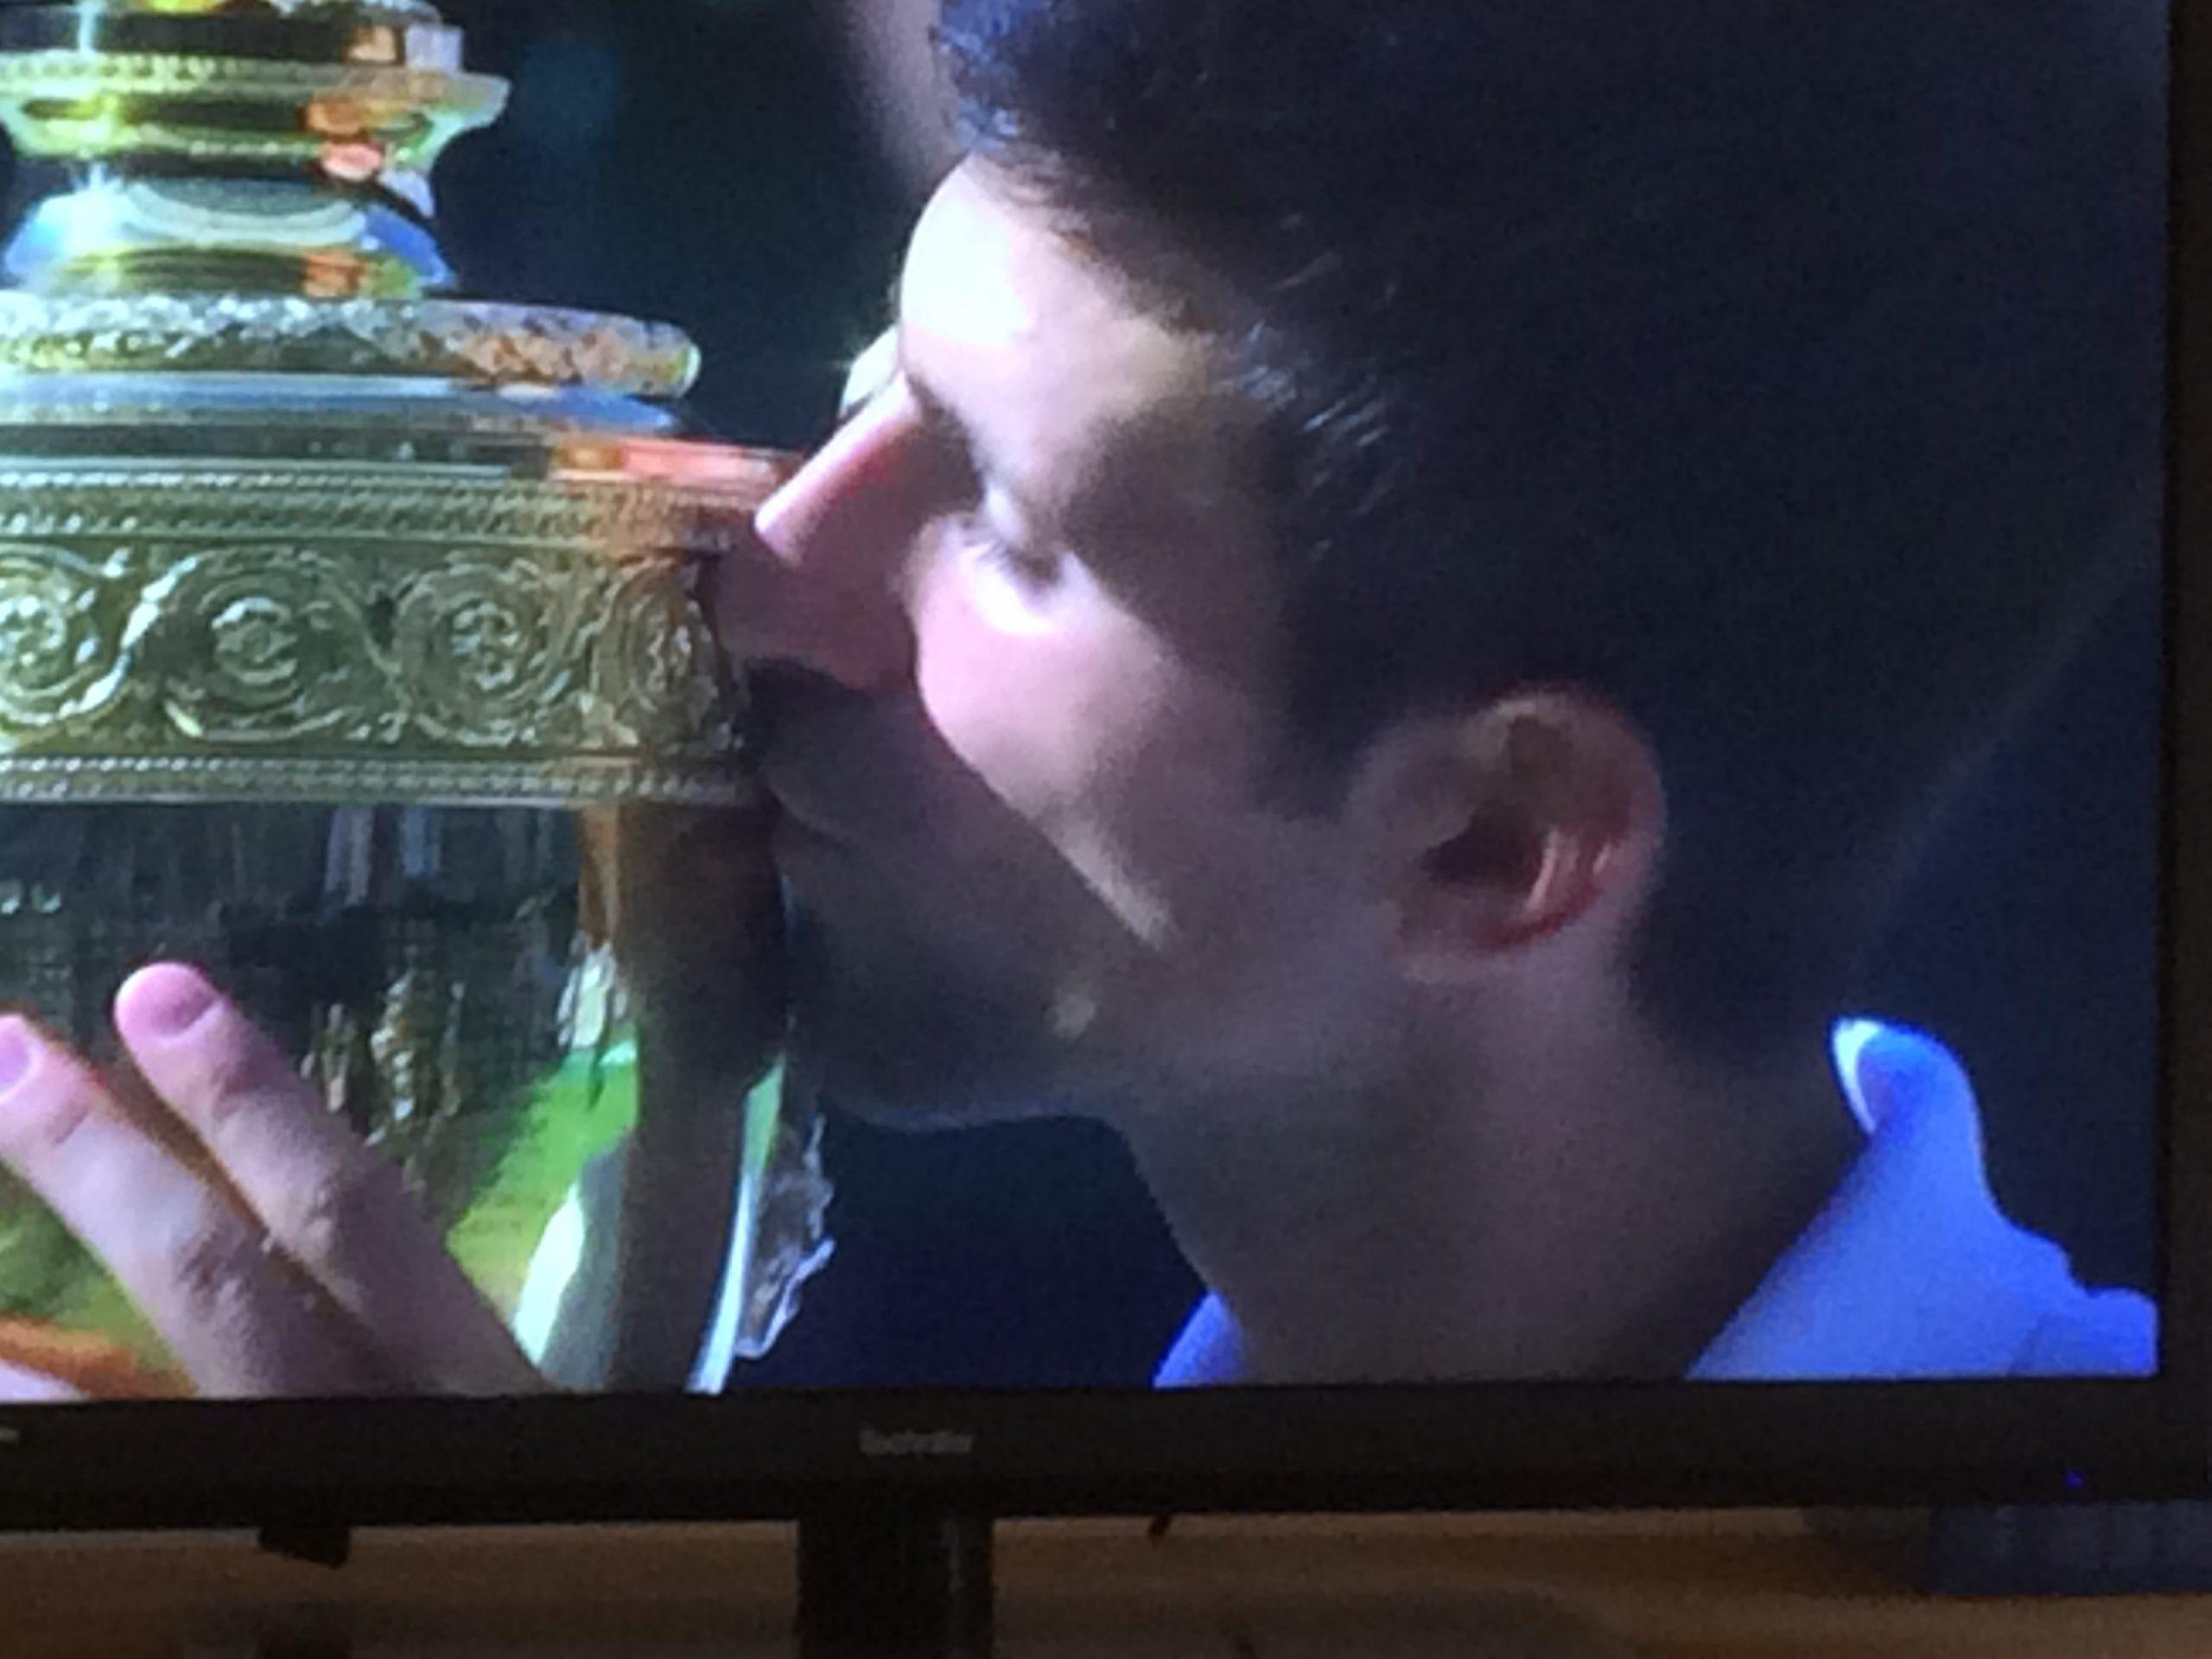 Djokovic with the Wimbledon trophy